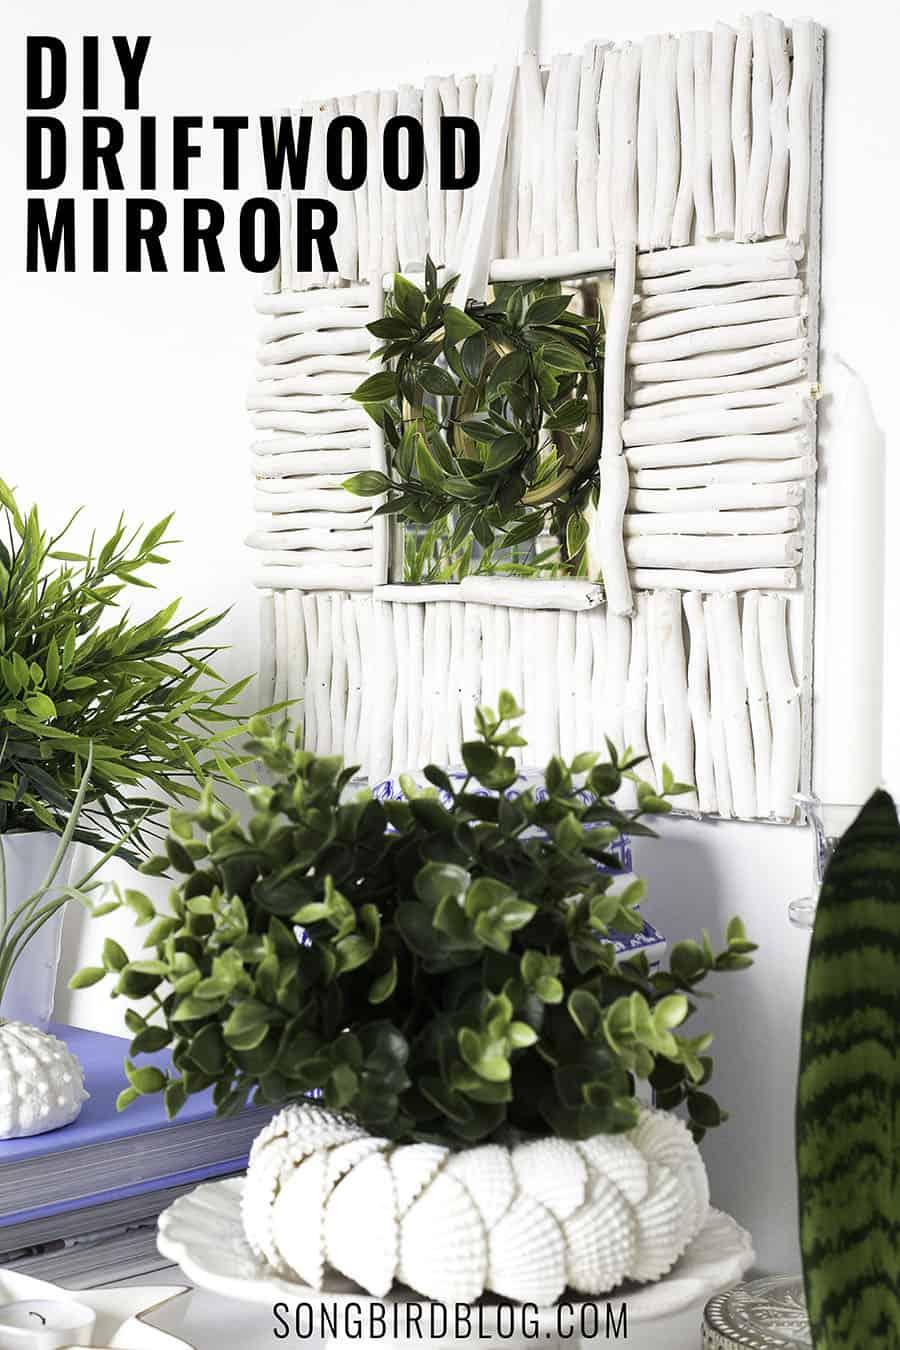 White driftwood mirror DIY